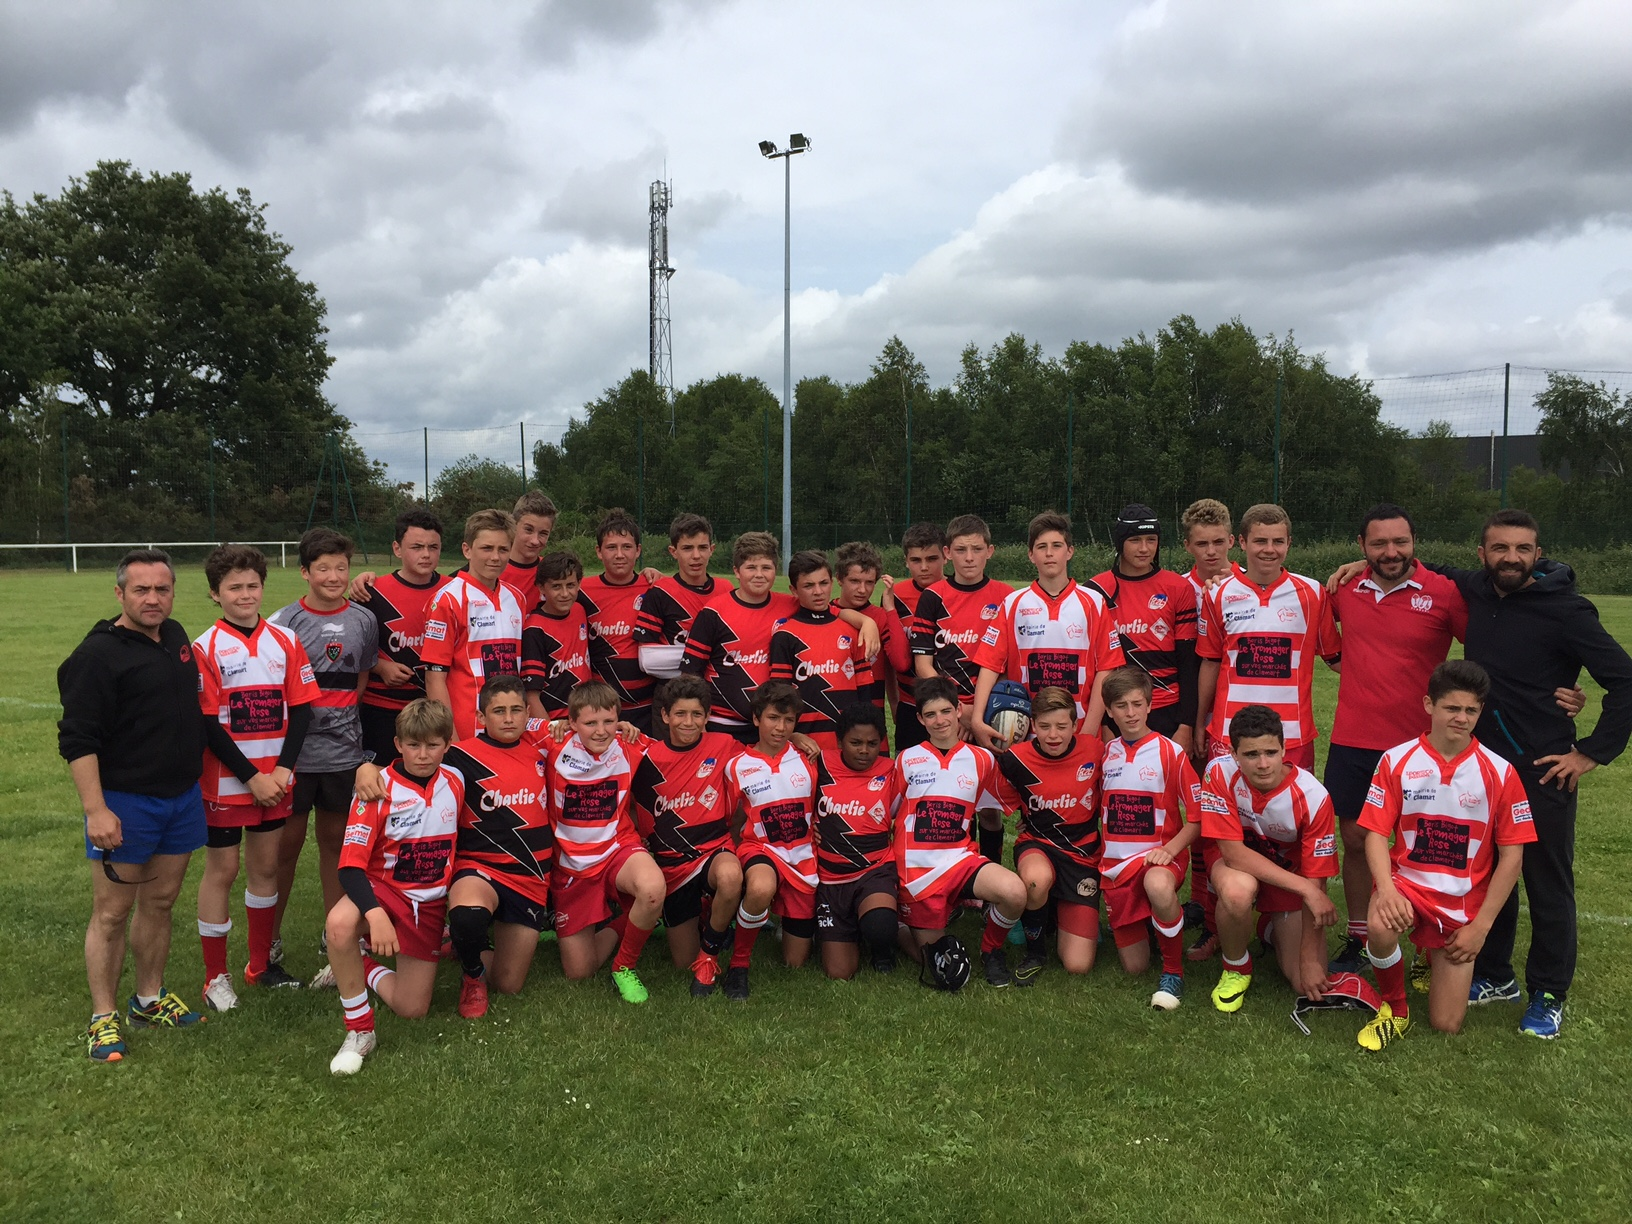 Clamart Rugby 92 U14 au tournoi de Lanester - Ecole de Rugby de Clamart 92-juin 2017